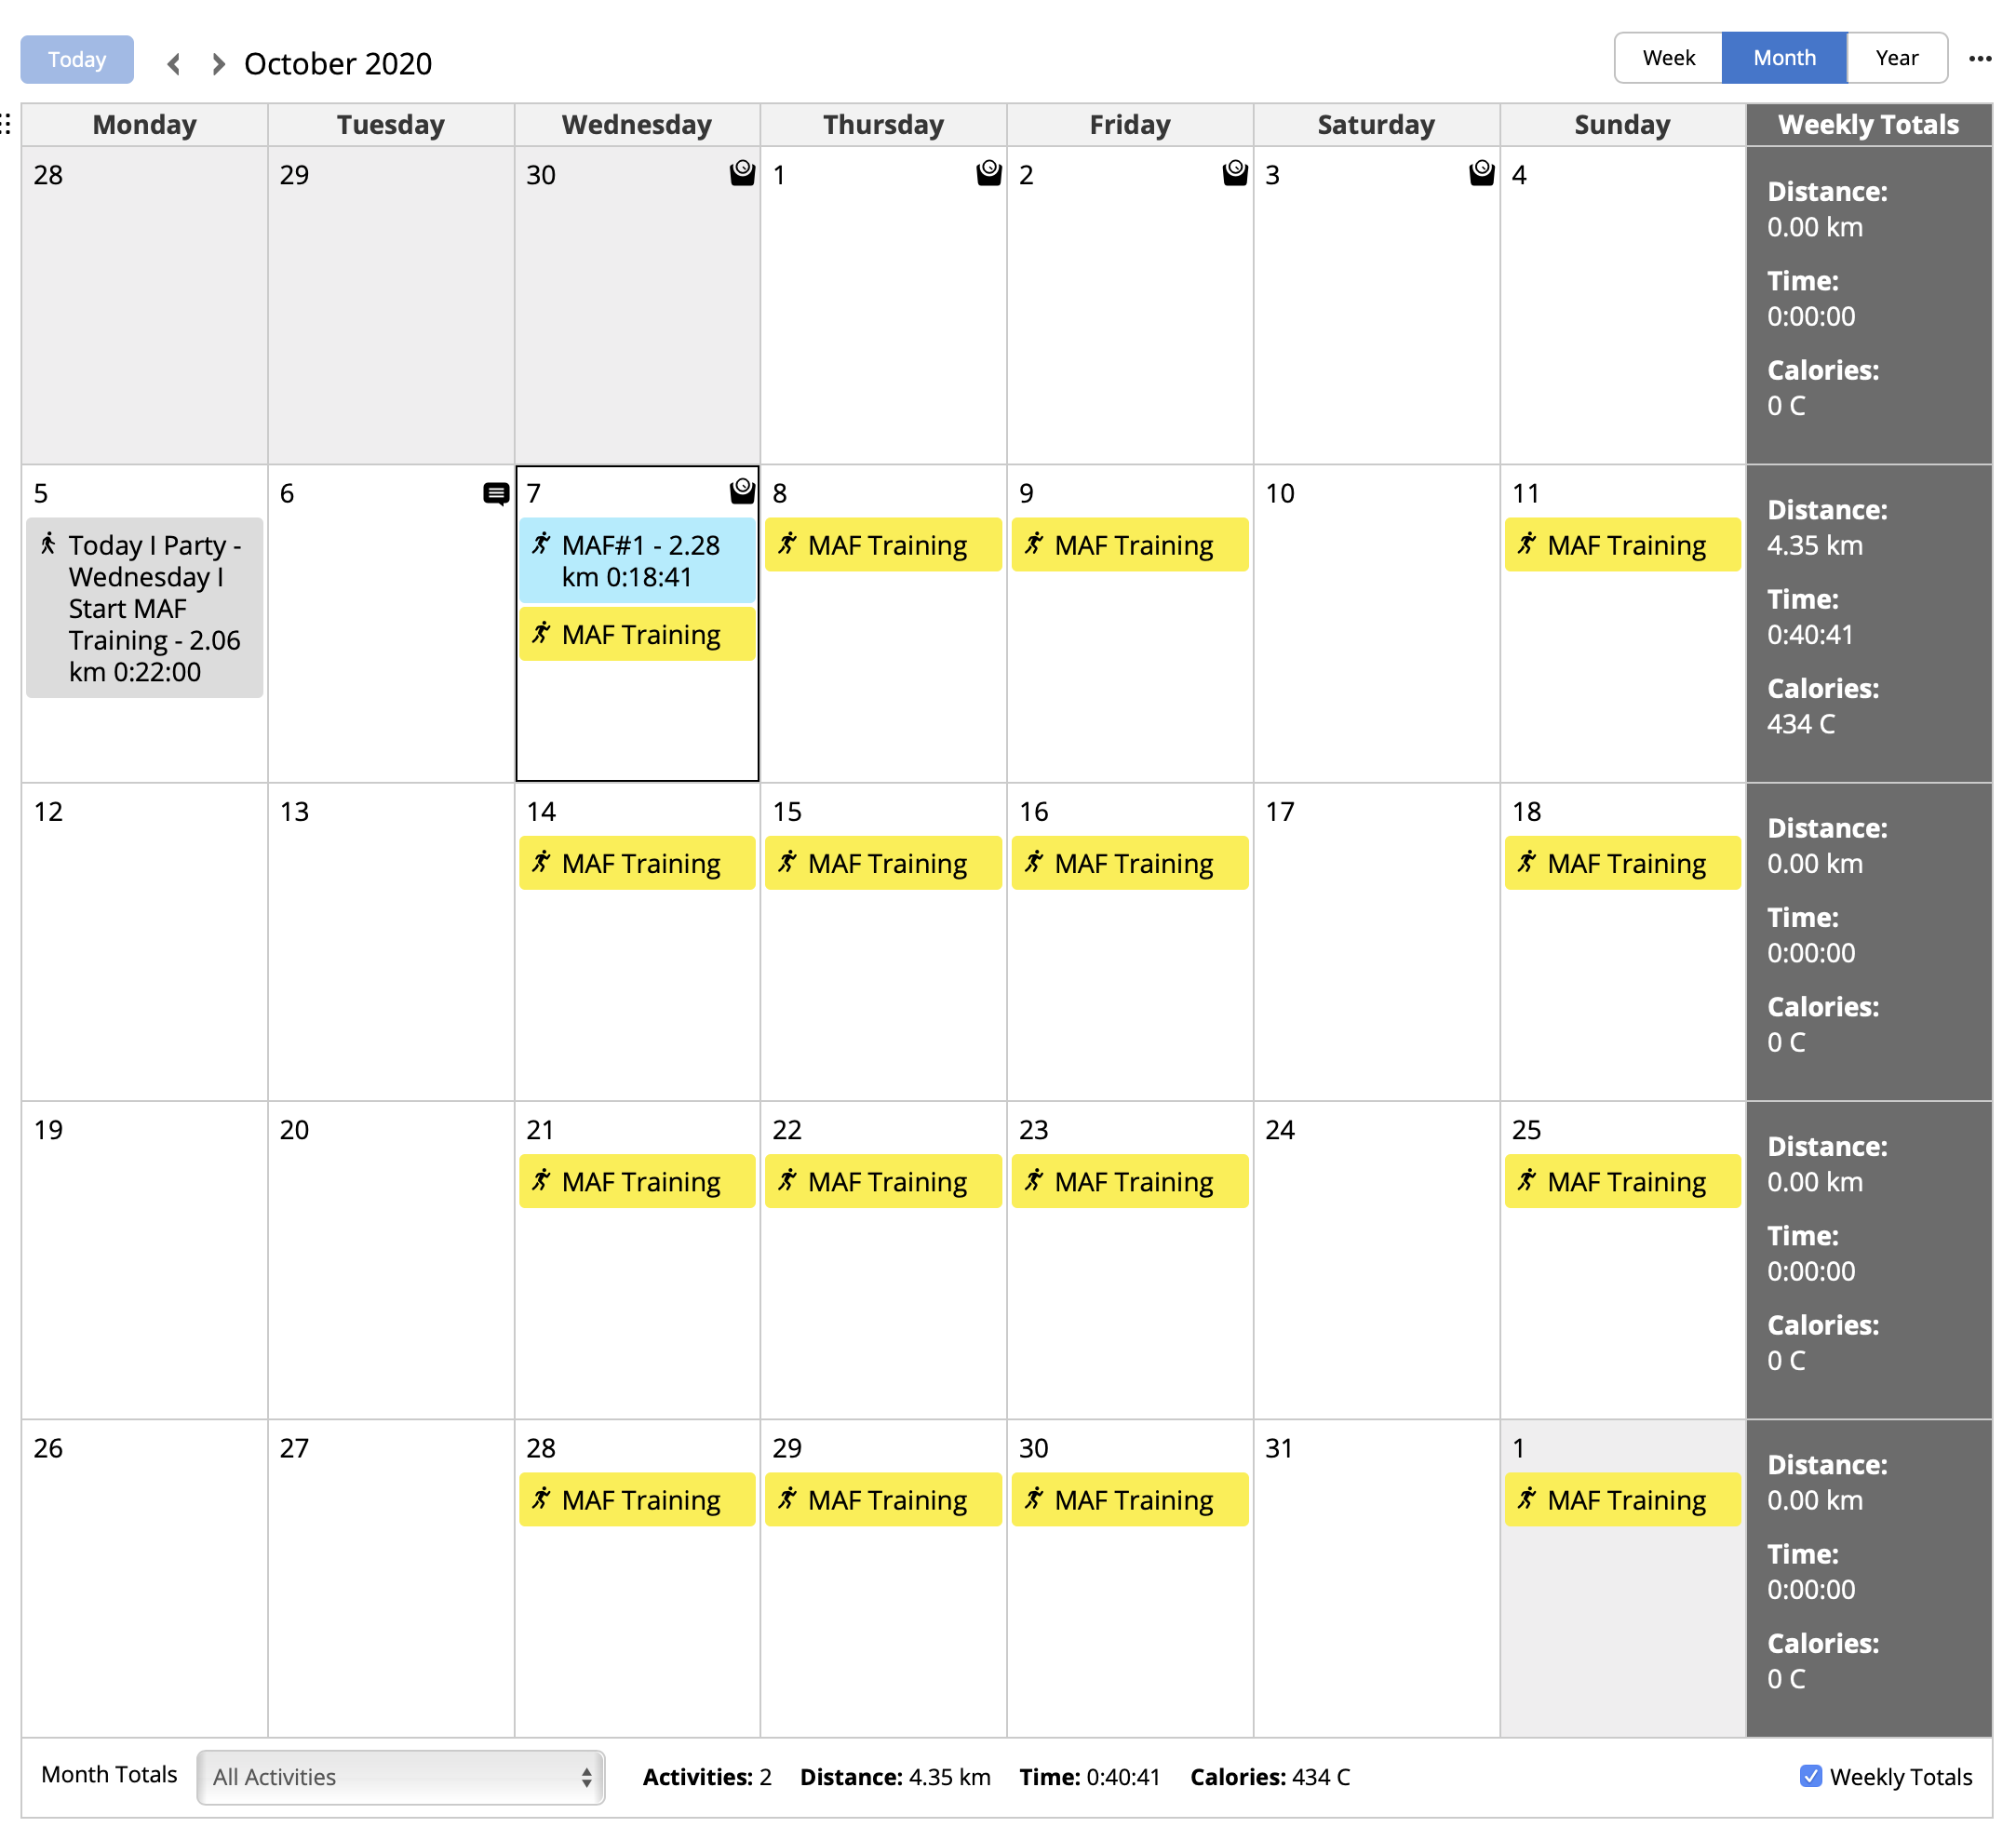 MAF Training Schedule (4 weeks)